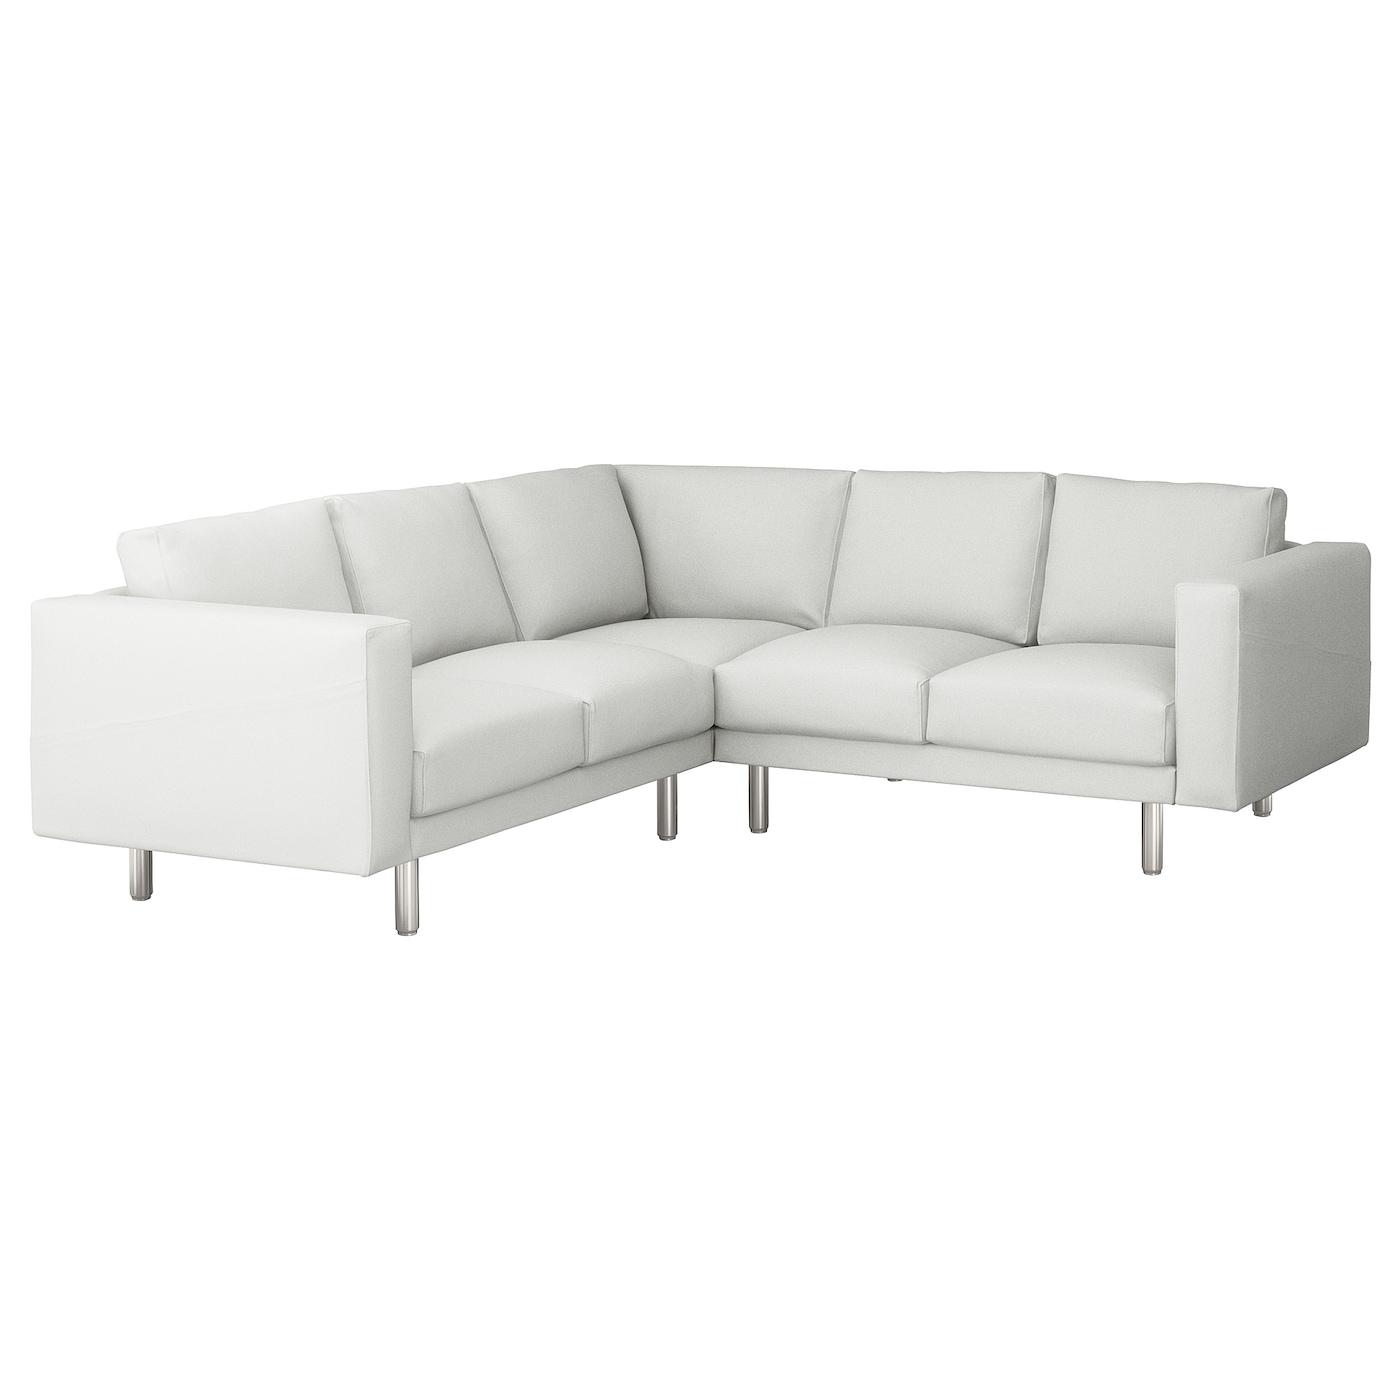 hellgraue couch sofa retro sitzer in hellgrau couch stoff polstersofa sitzmbel stoffsofa. Black Bedroom Furniture Sets. Home Design Ideas